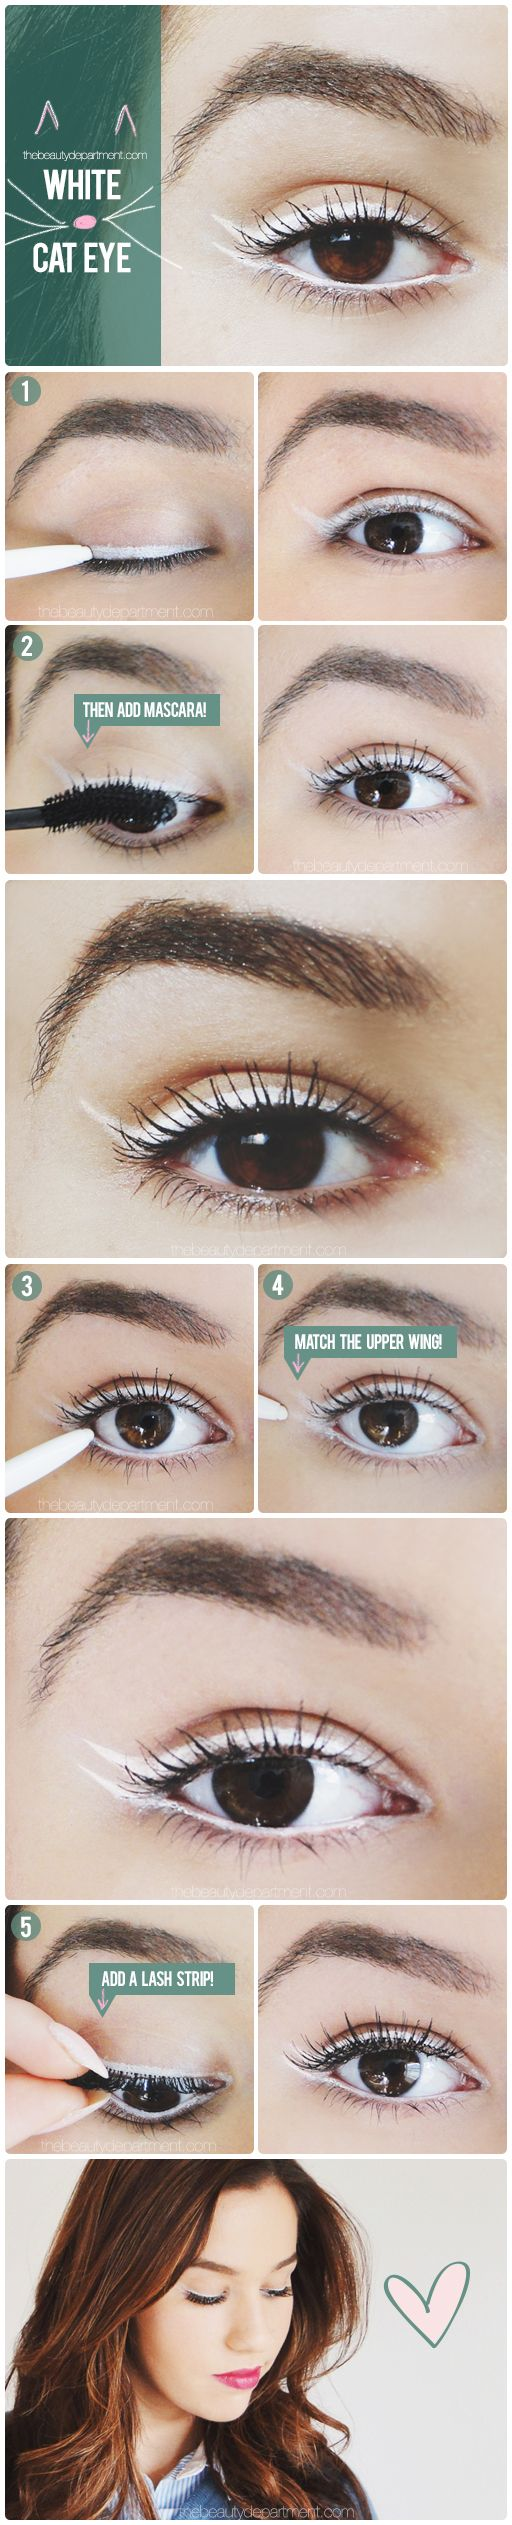 25+ best ideas about White eyeliner on Pinterest   Double eyeliner ...